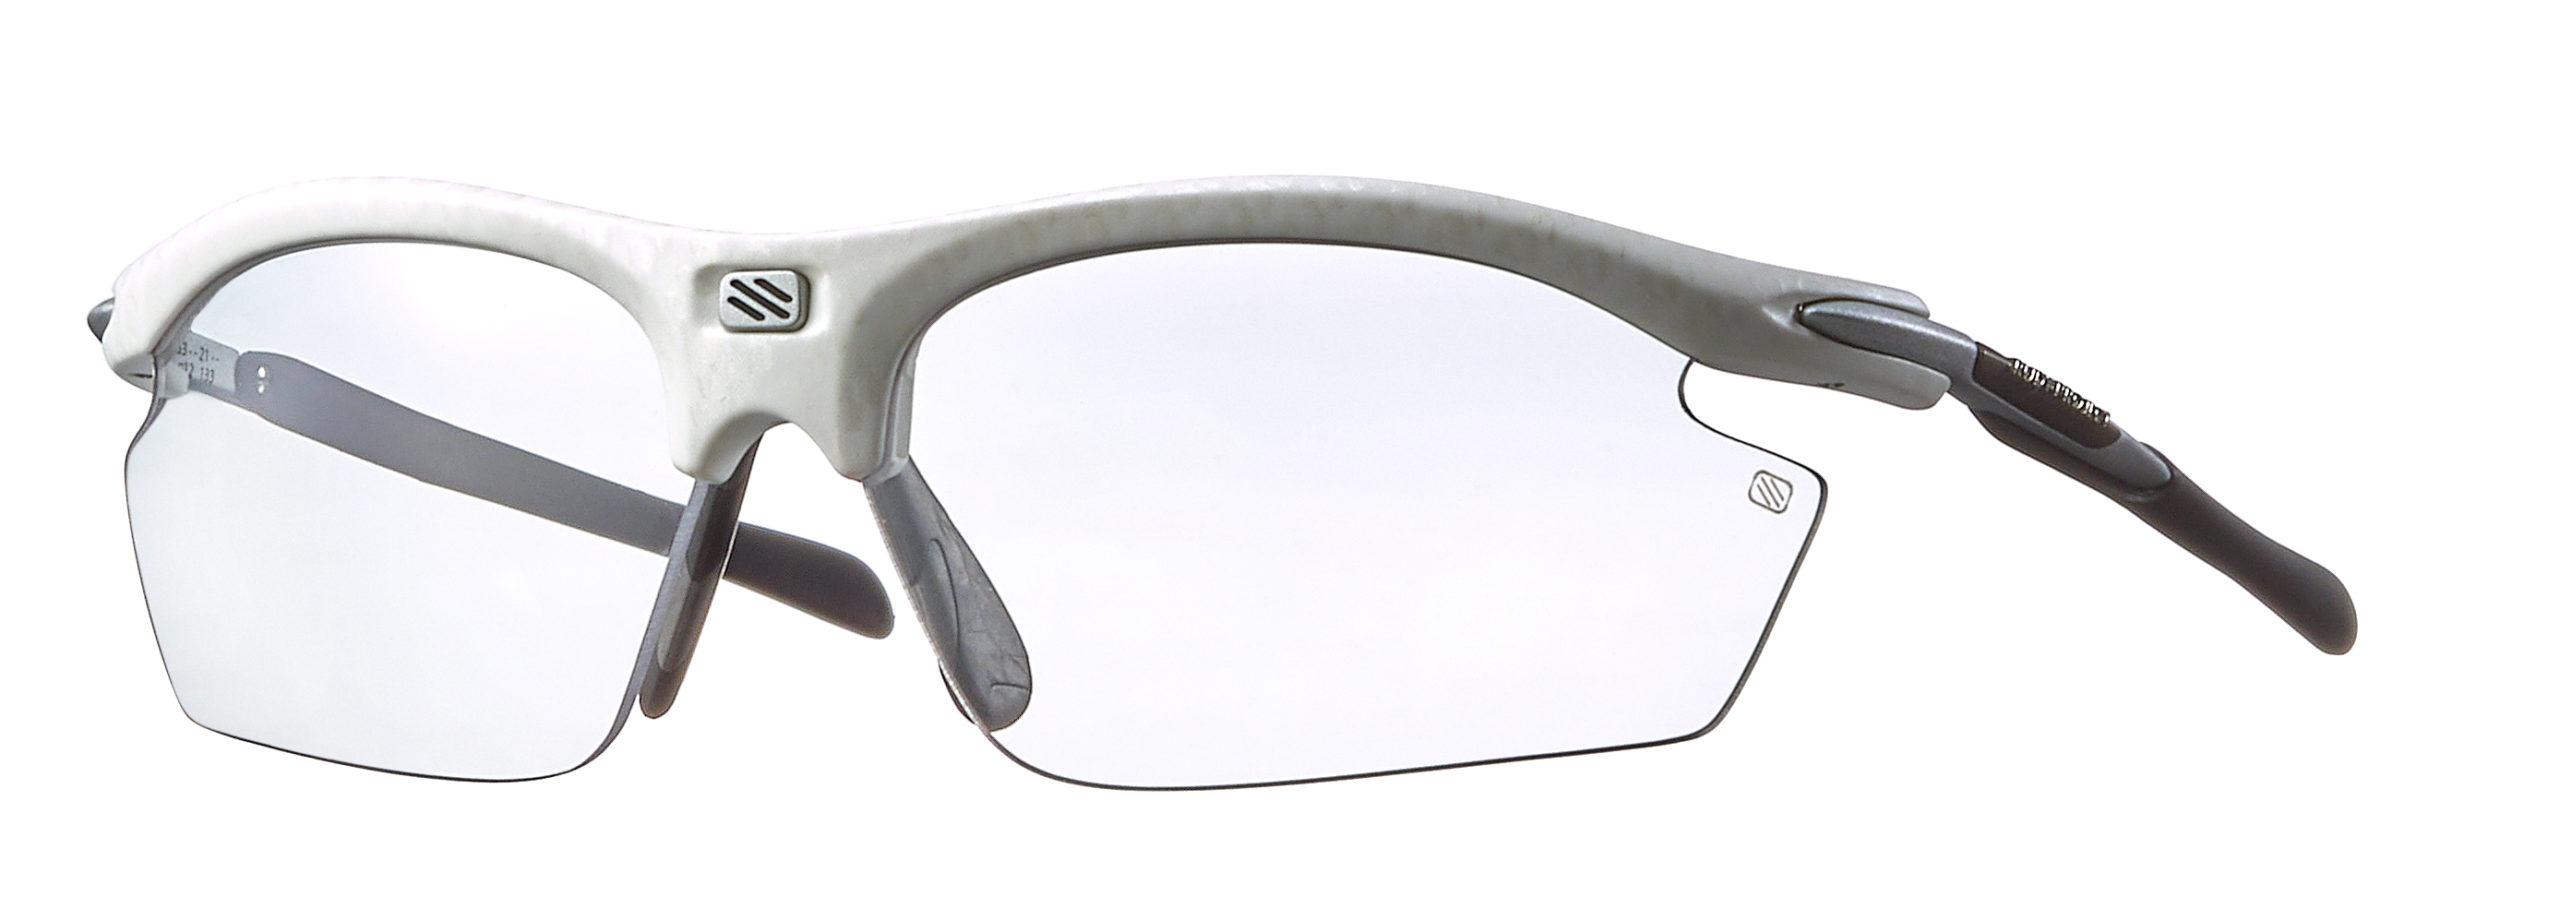 Rydon Slim - white carbon